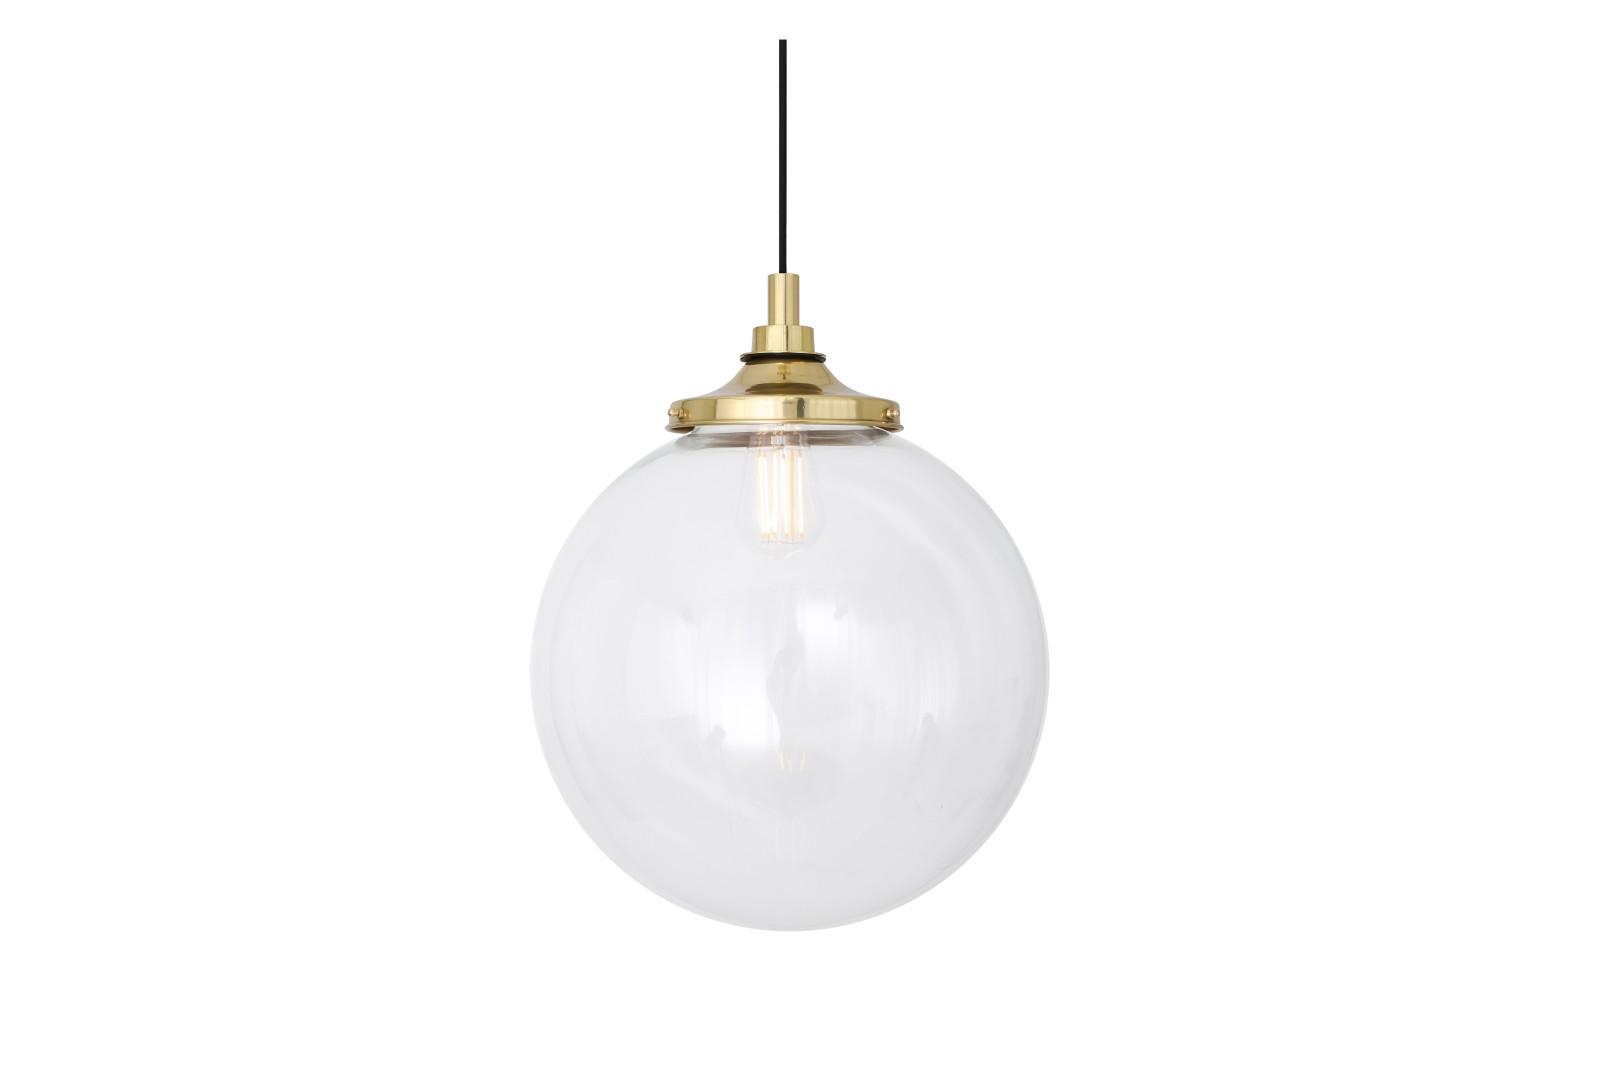 Laguna 35 cm Pendant Light Polished Brass